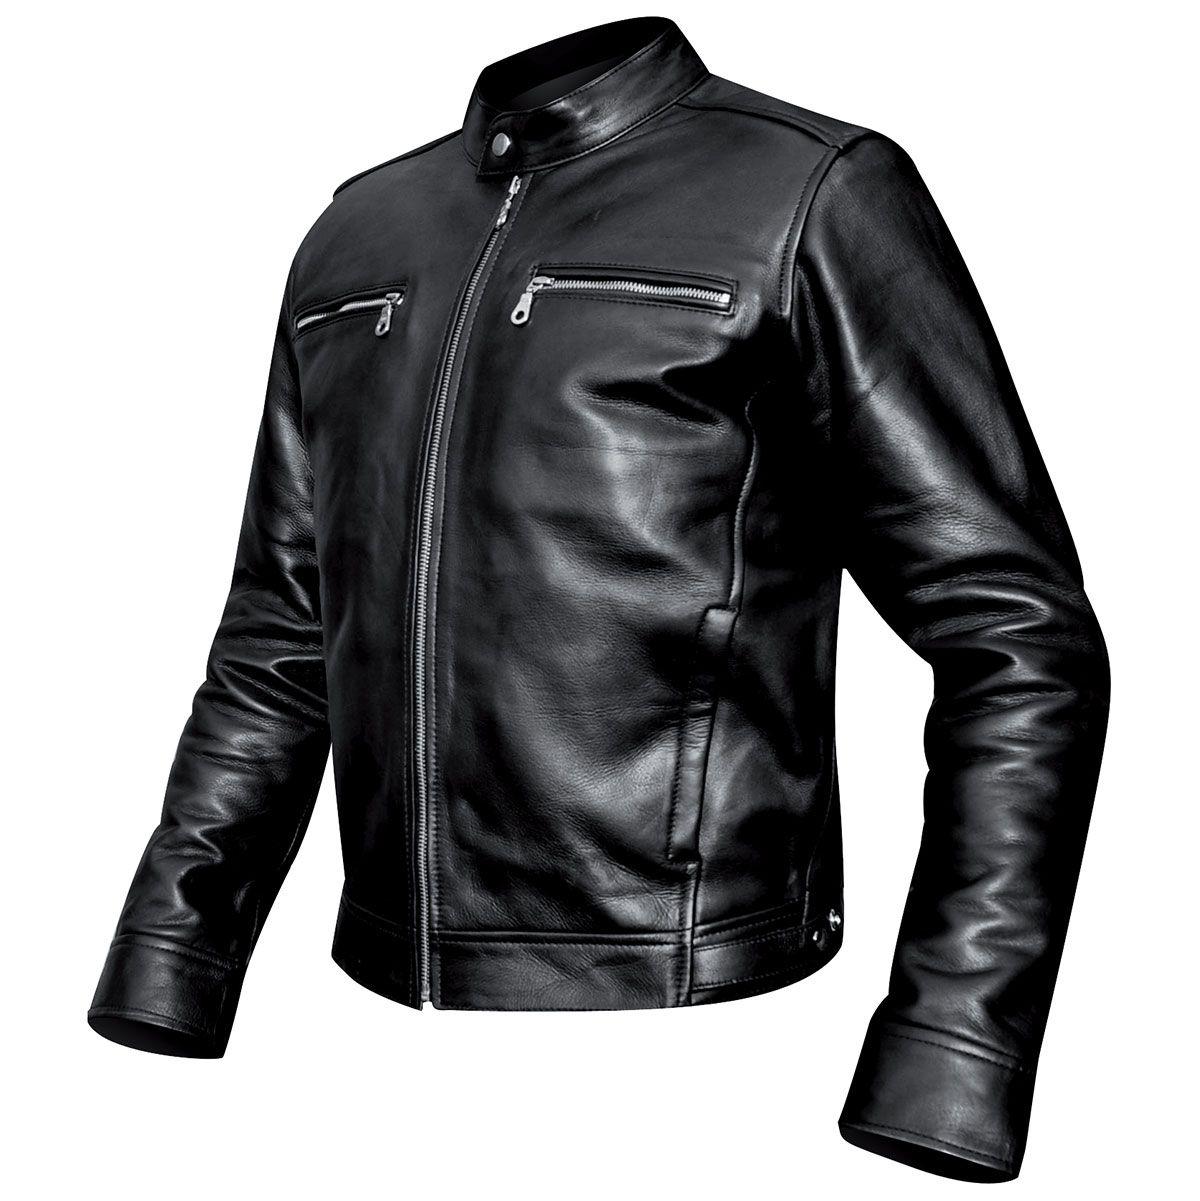 blouson cuir mec osx harrison jacket vestes blousons rock a gogo. Black Bedroom Furniture Sets. Home Design Ideas